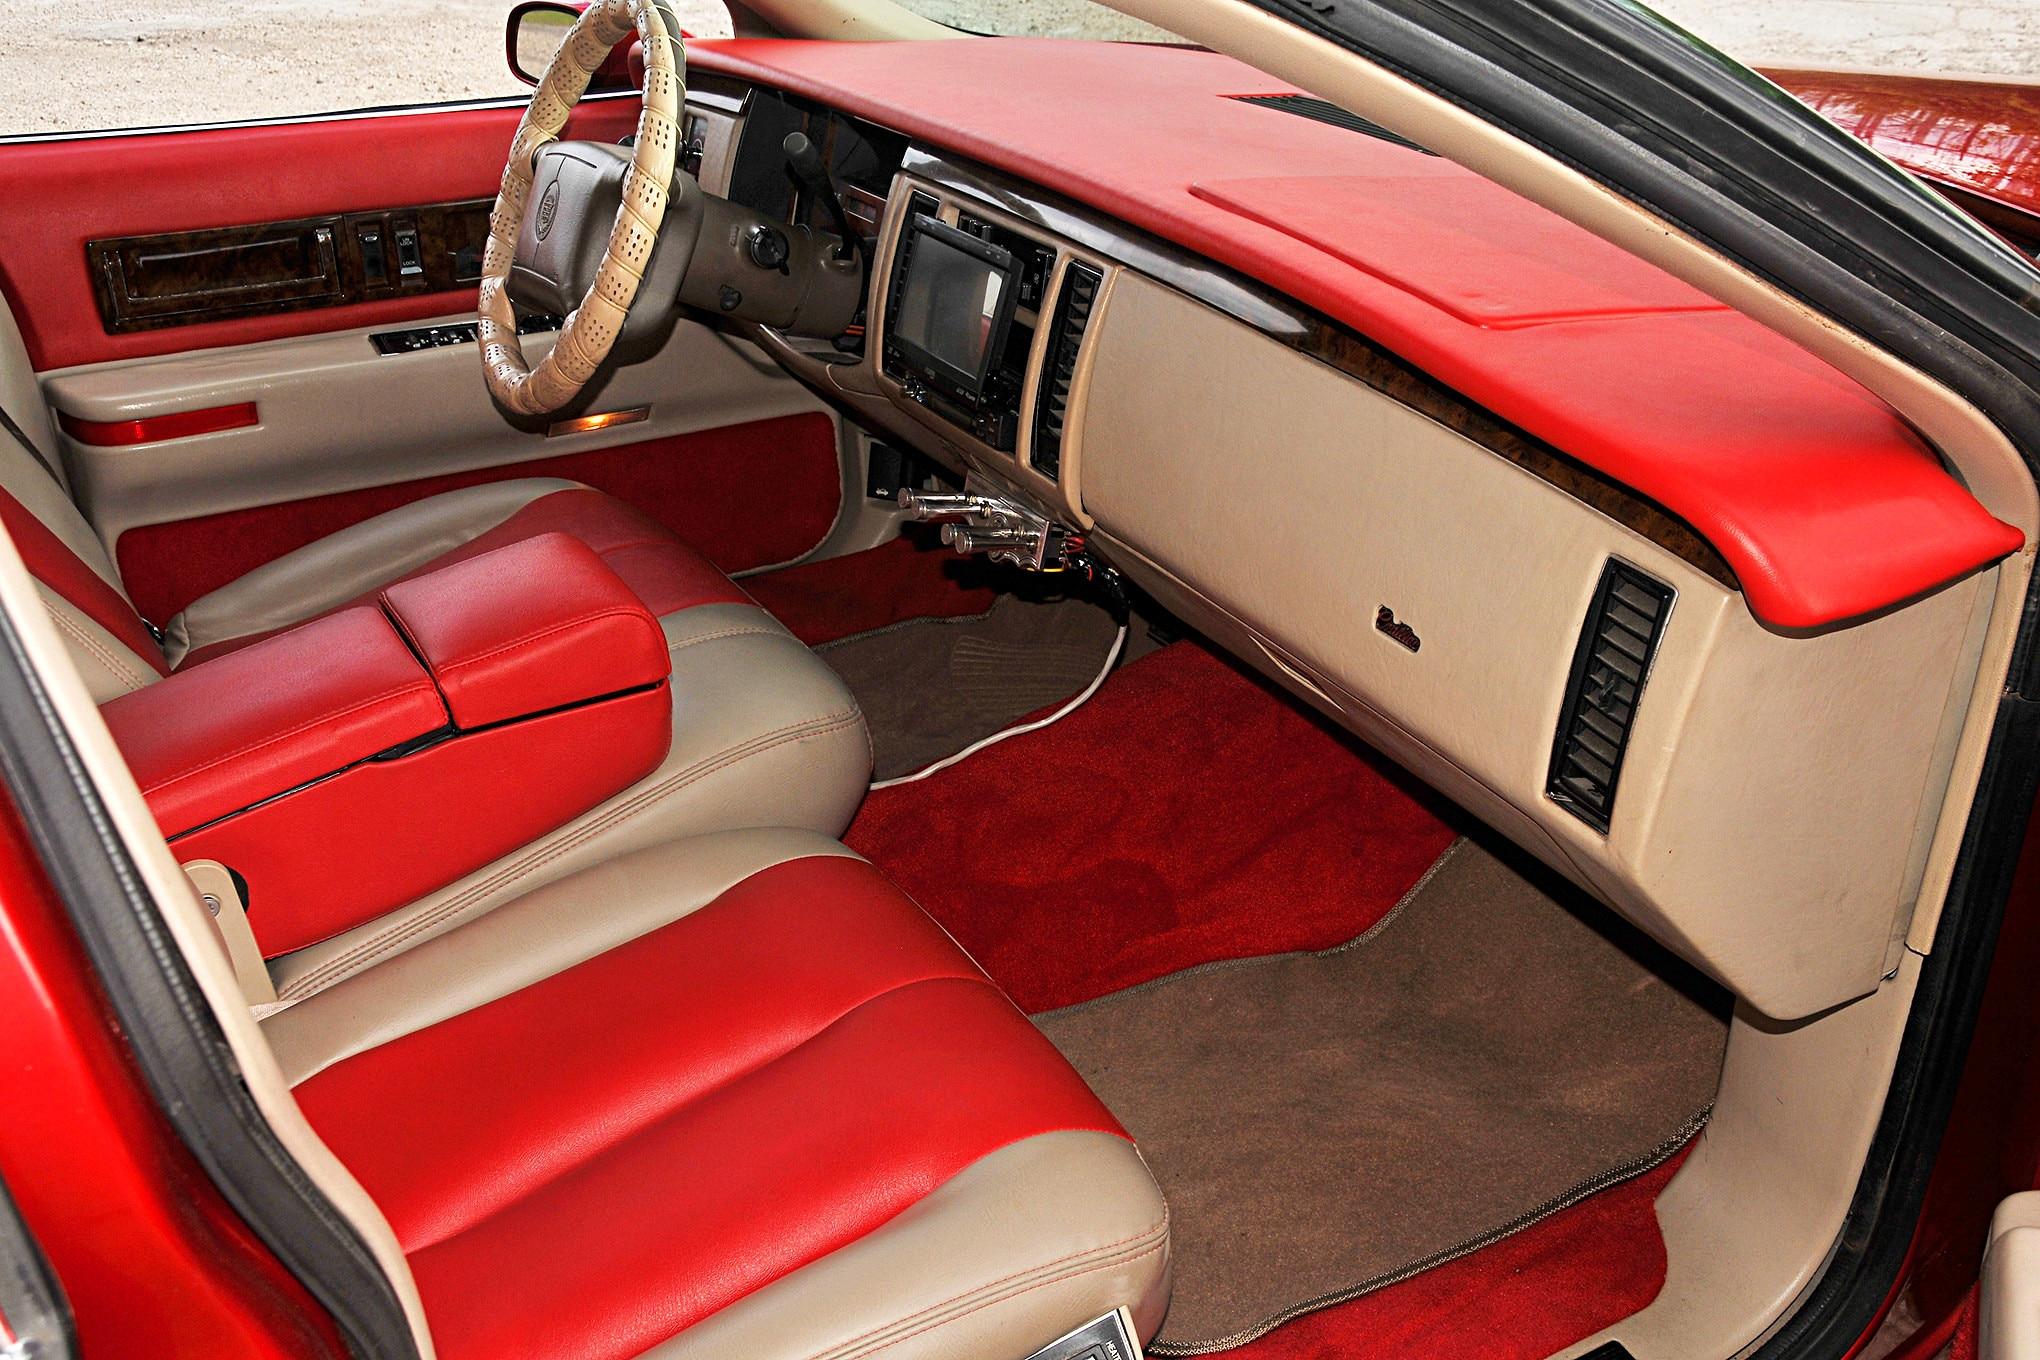 1994 Cadillac Fleetwood Interior